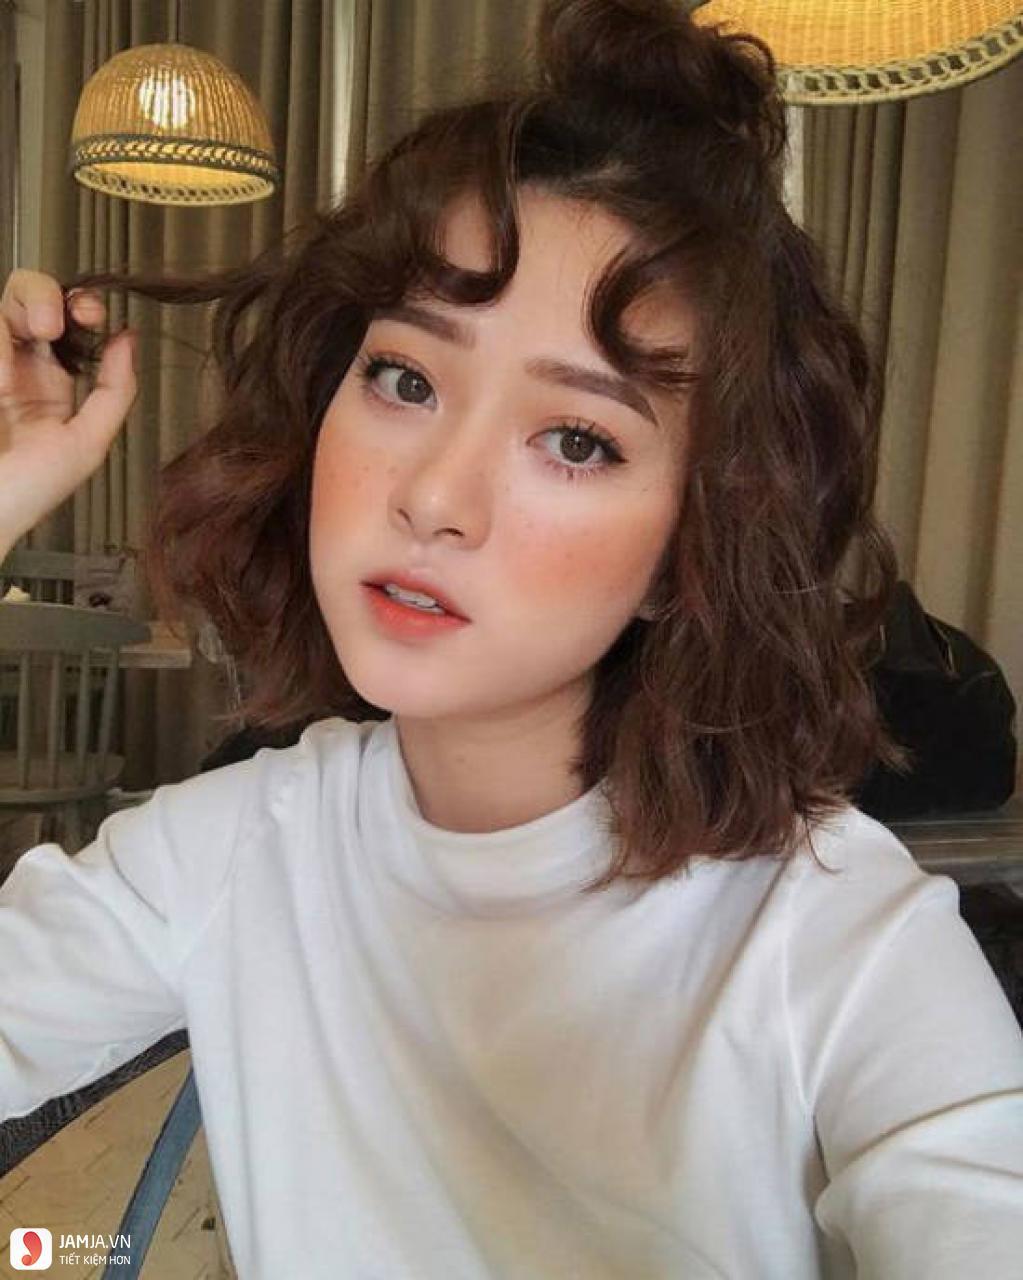 hair salon tóc mới